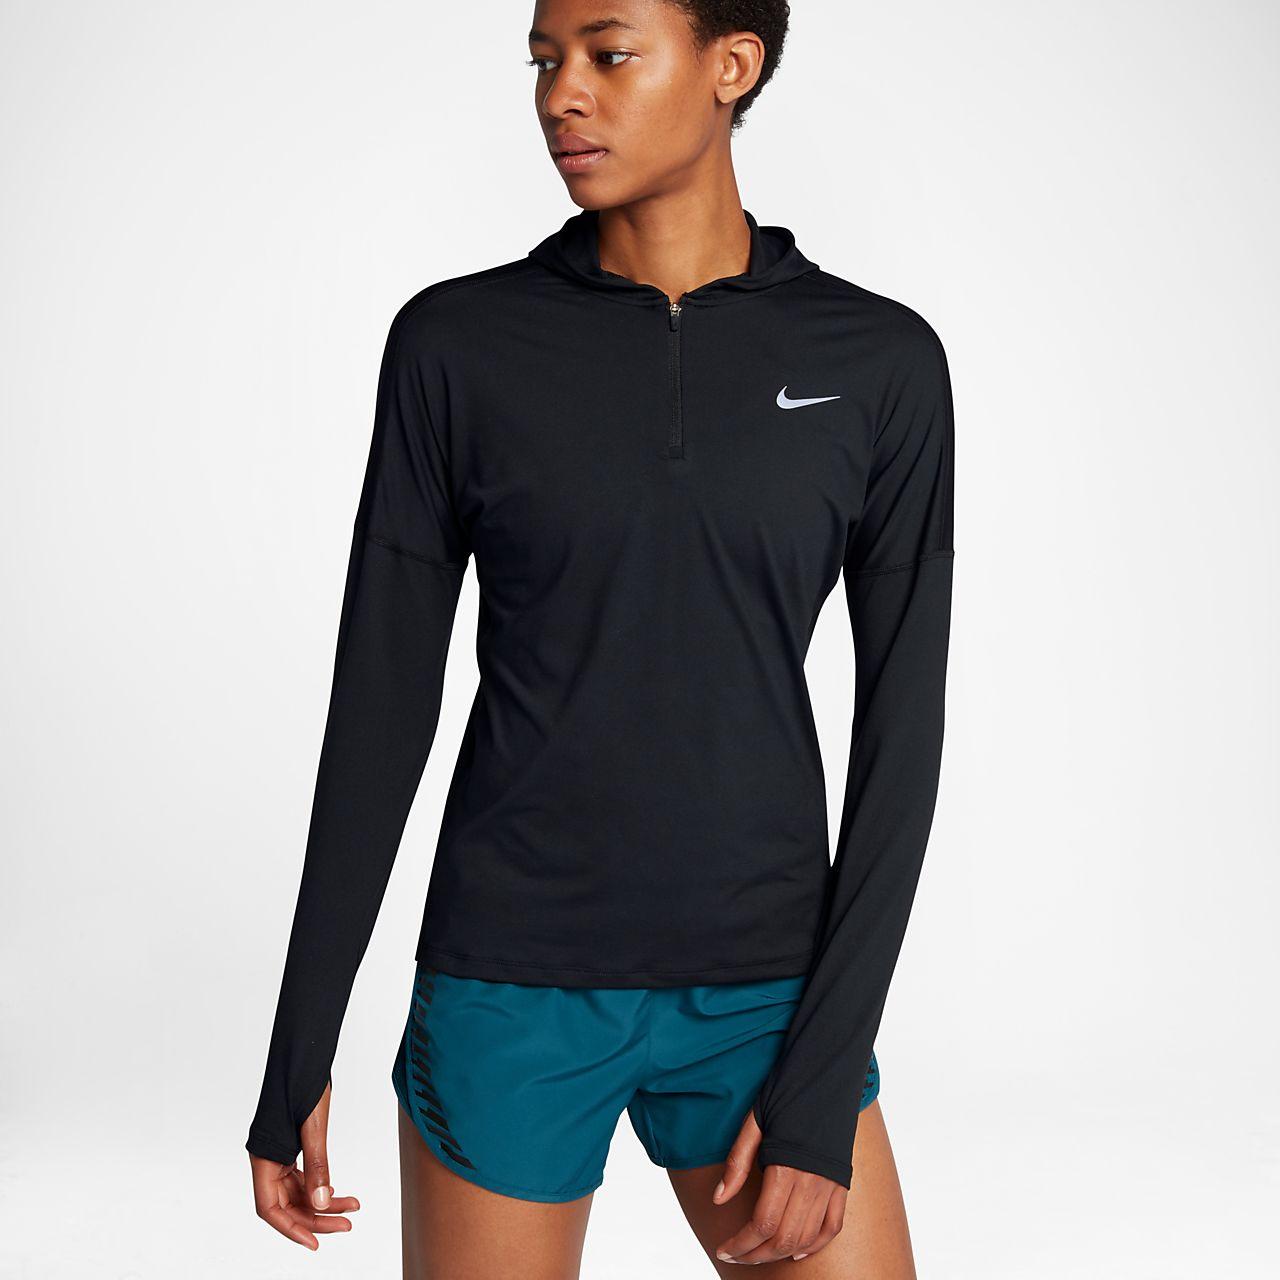 Nike Dri-FIT Element Women Running Half-Zip Hoodie